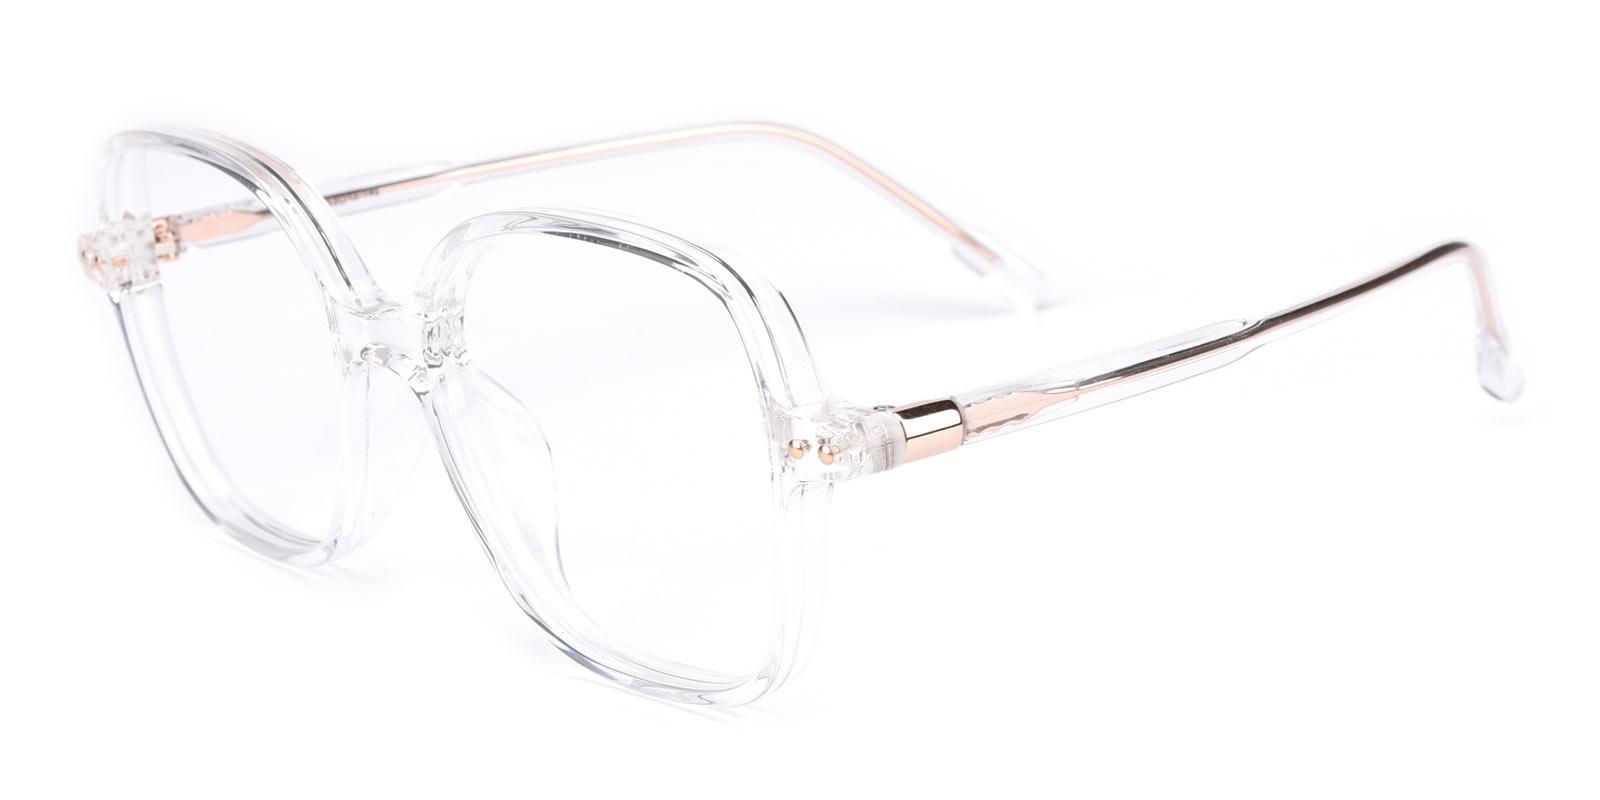 Garfield-Translucent-Square-TR-Eyeglasses-detail